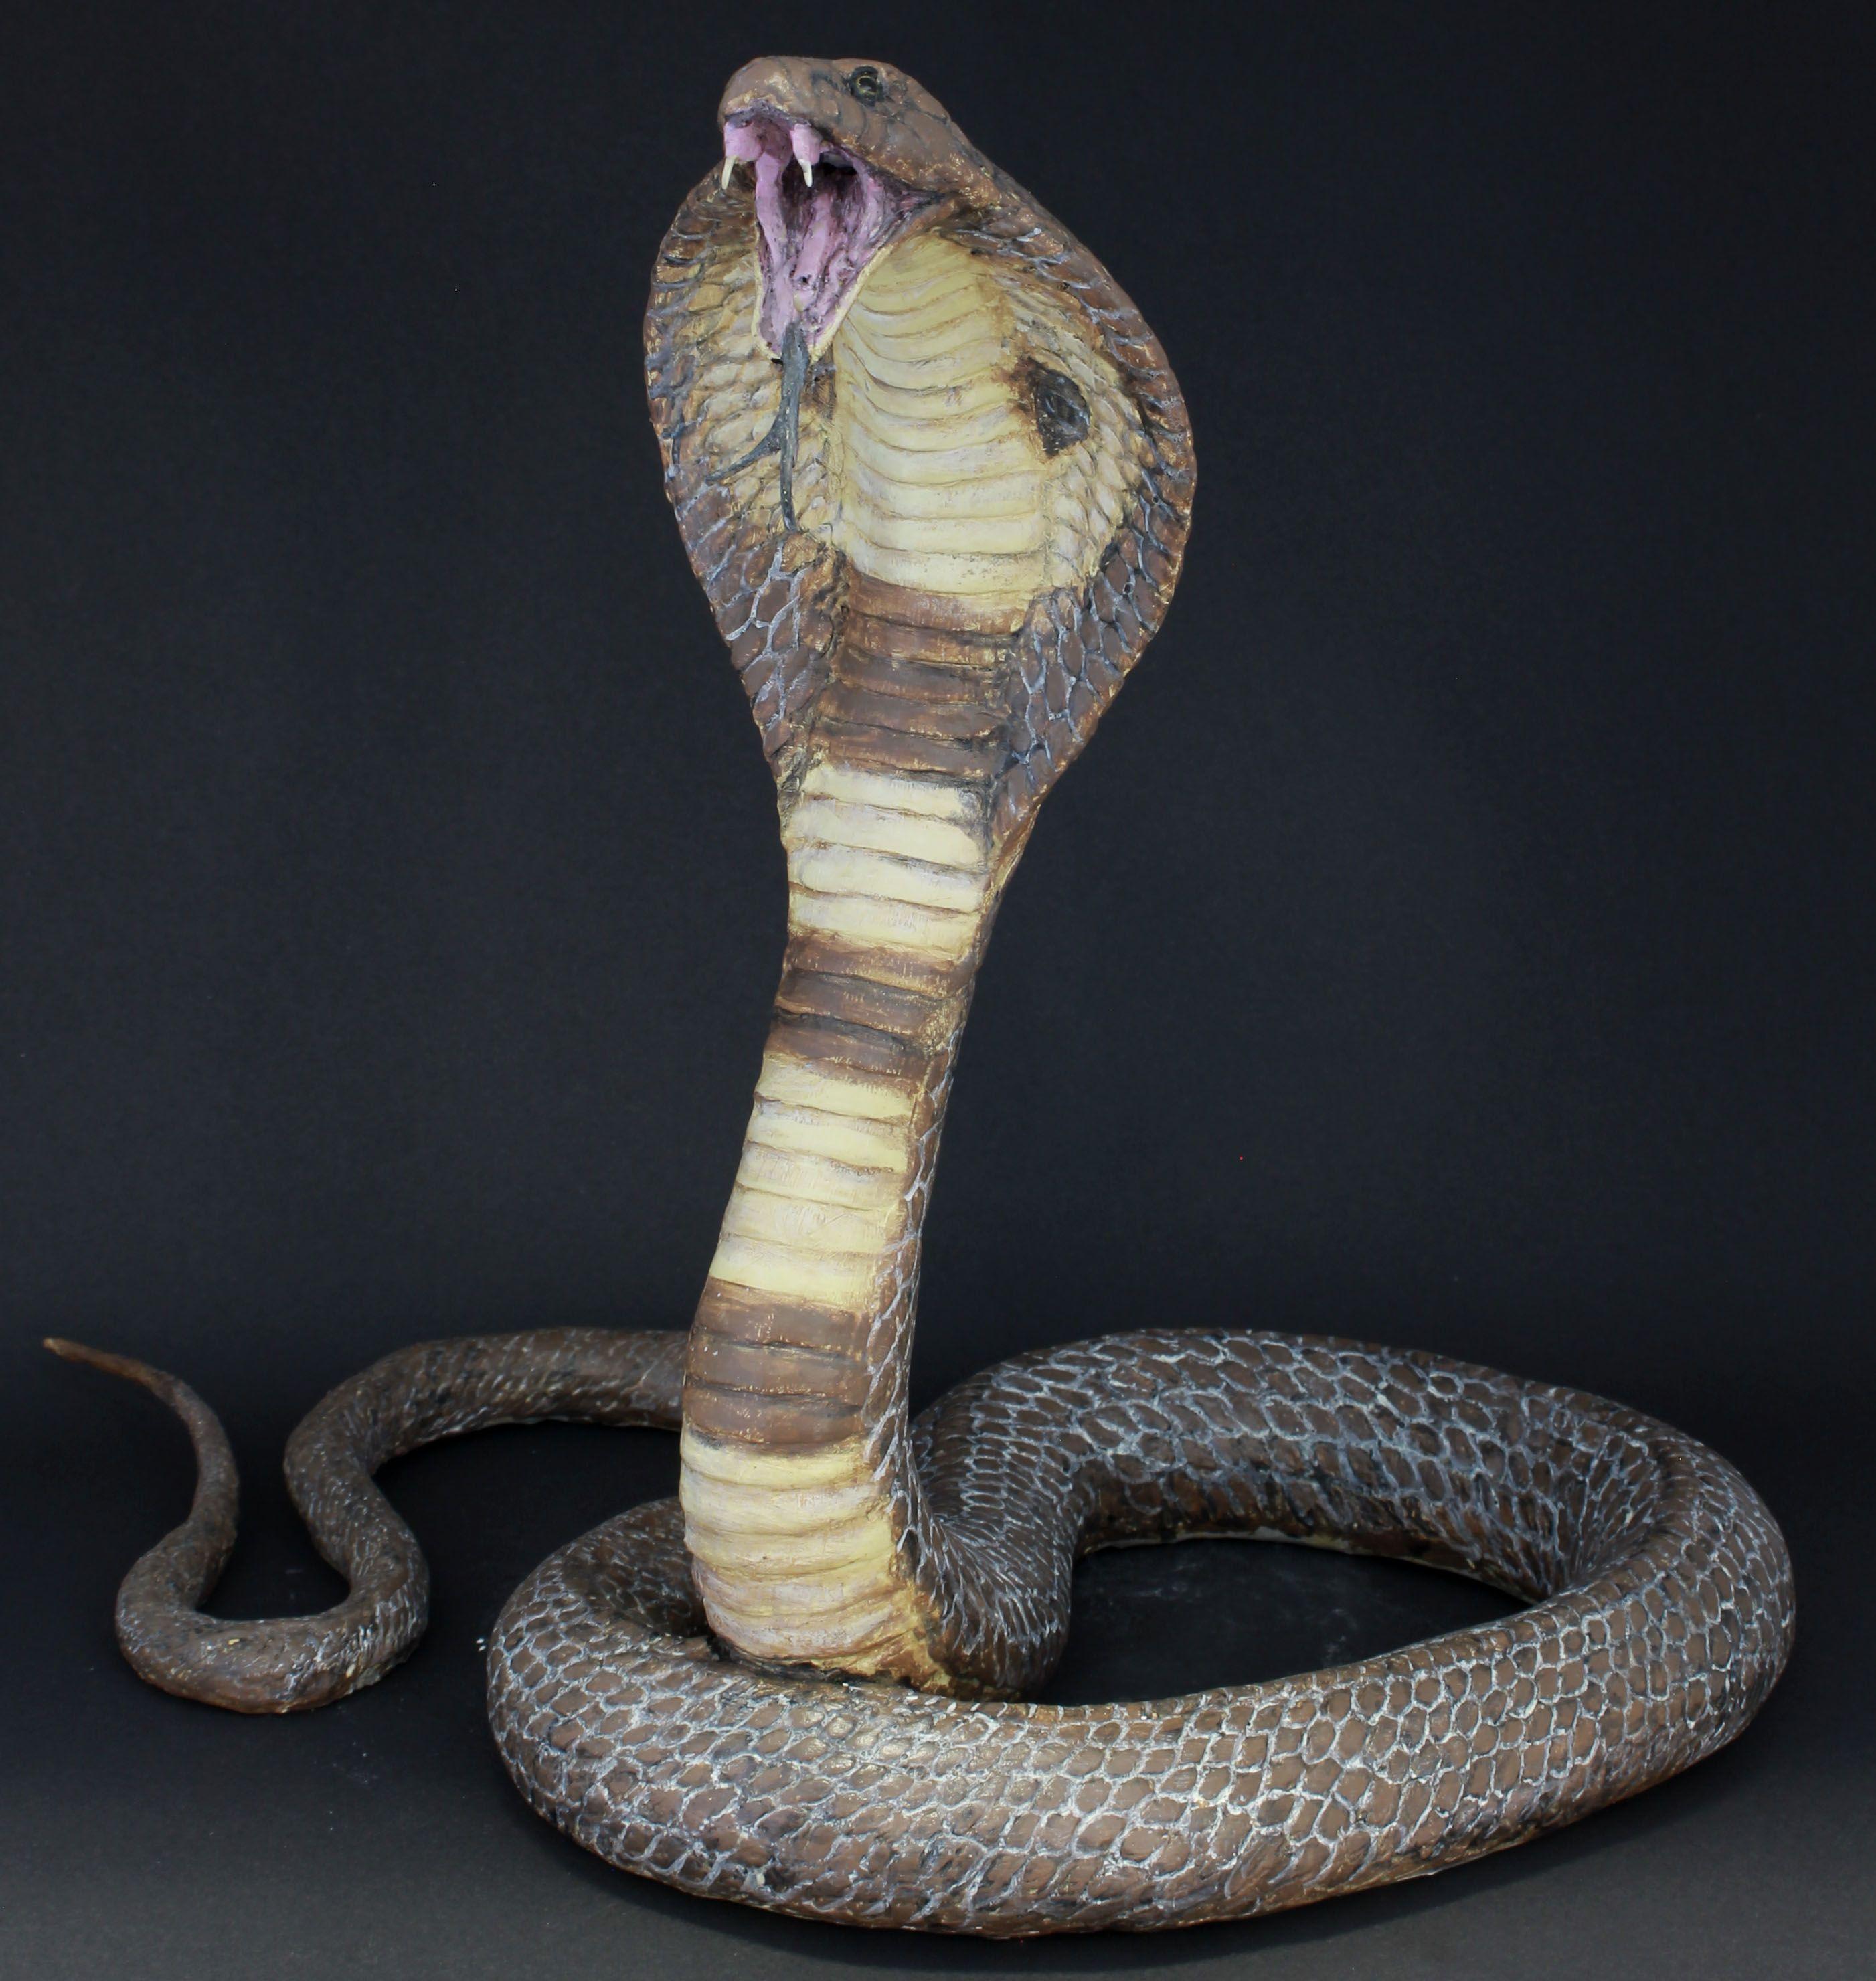 Life size-ish sculpture of \'Spectacled Cobra\' (naja naja) Created ...